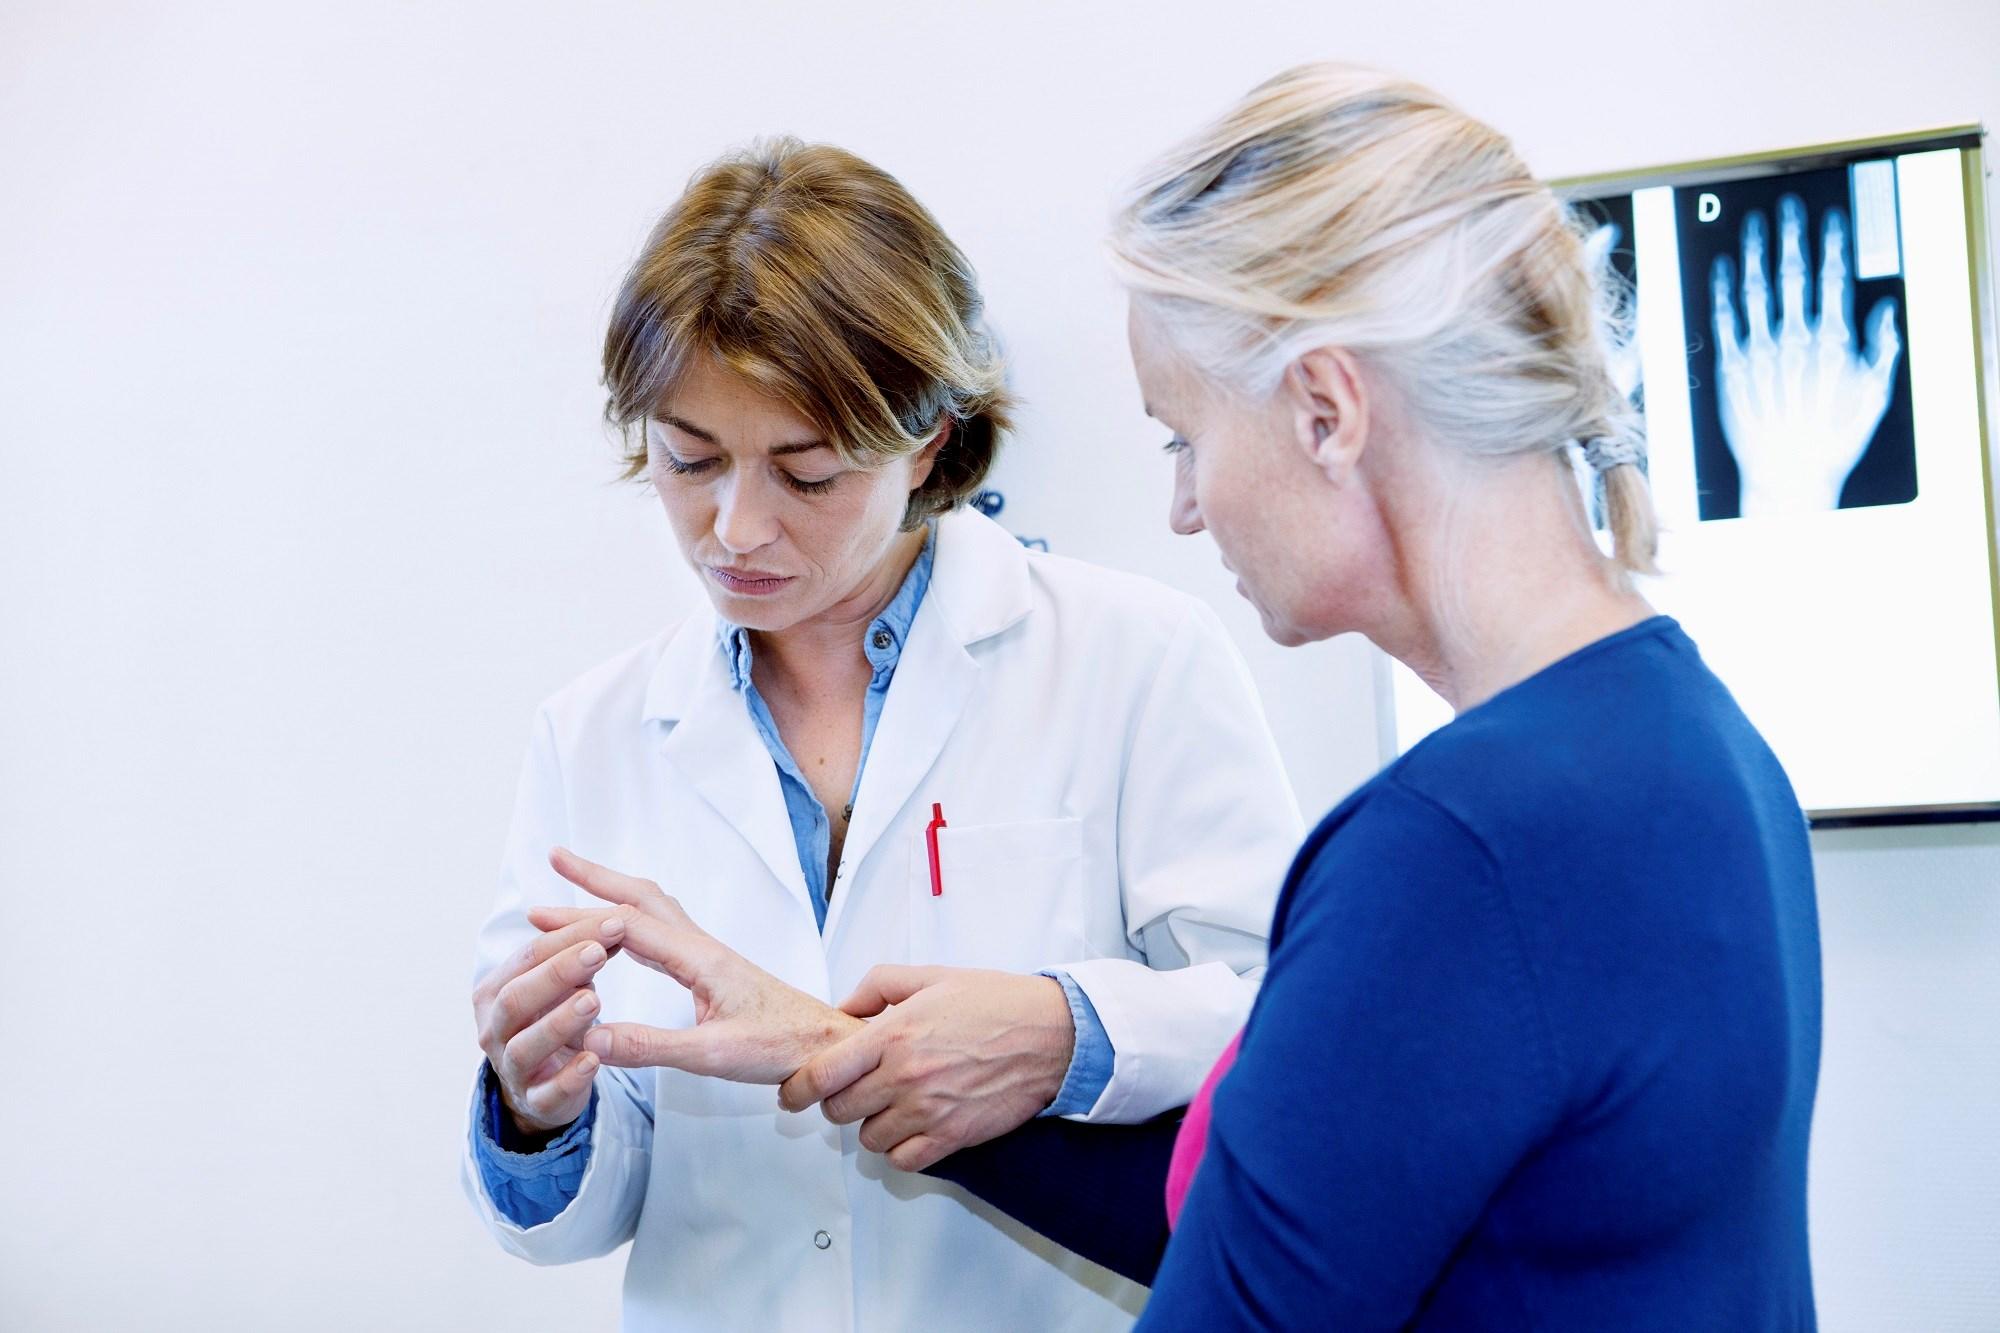 PROMIS Effective for Physical, Mental Health Assessment in DMARD-Treated Rheumatoid Arthritis